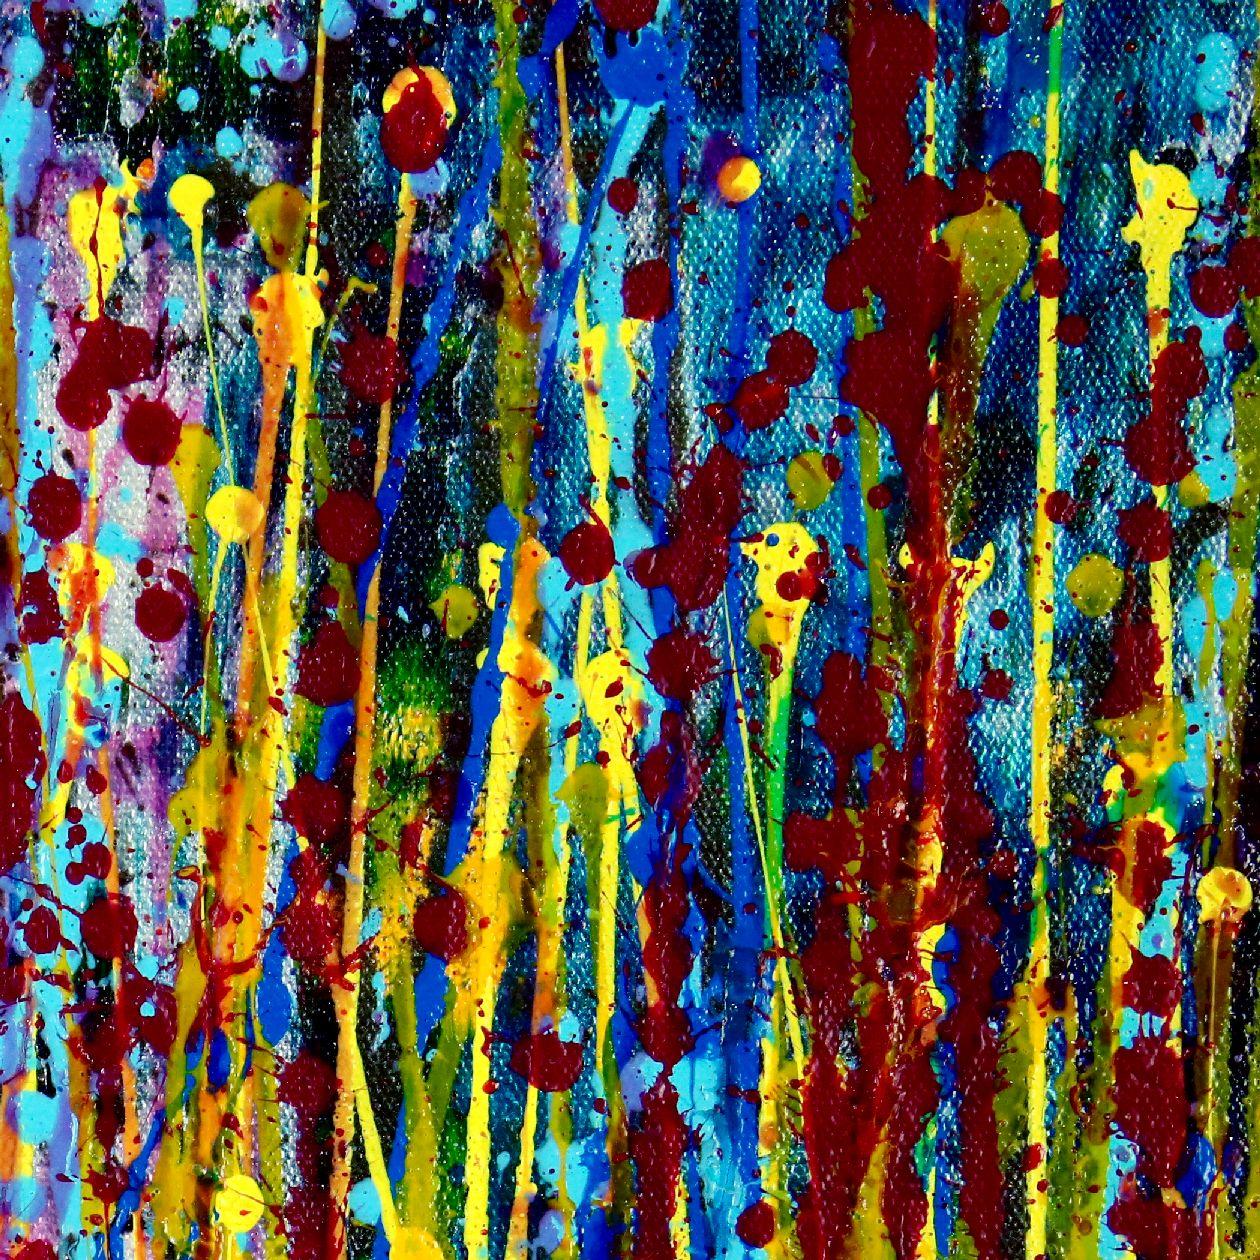 Detail - Blooming Garden 4 (Flow Spectra) by Nestor Toro